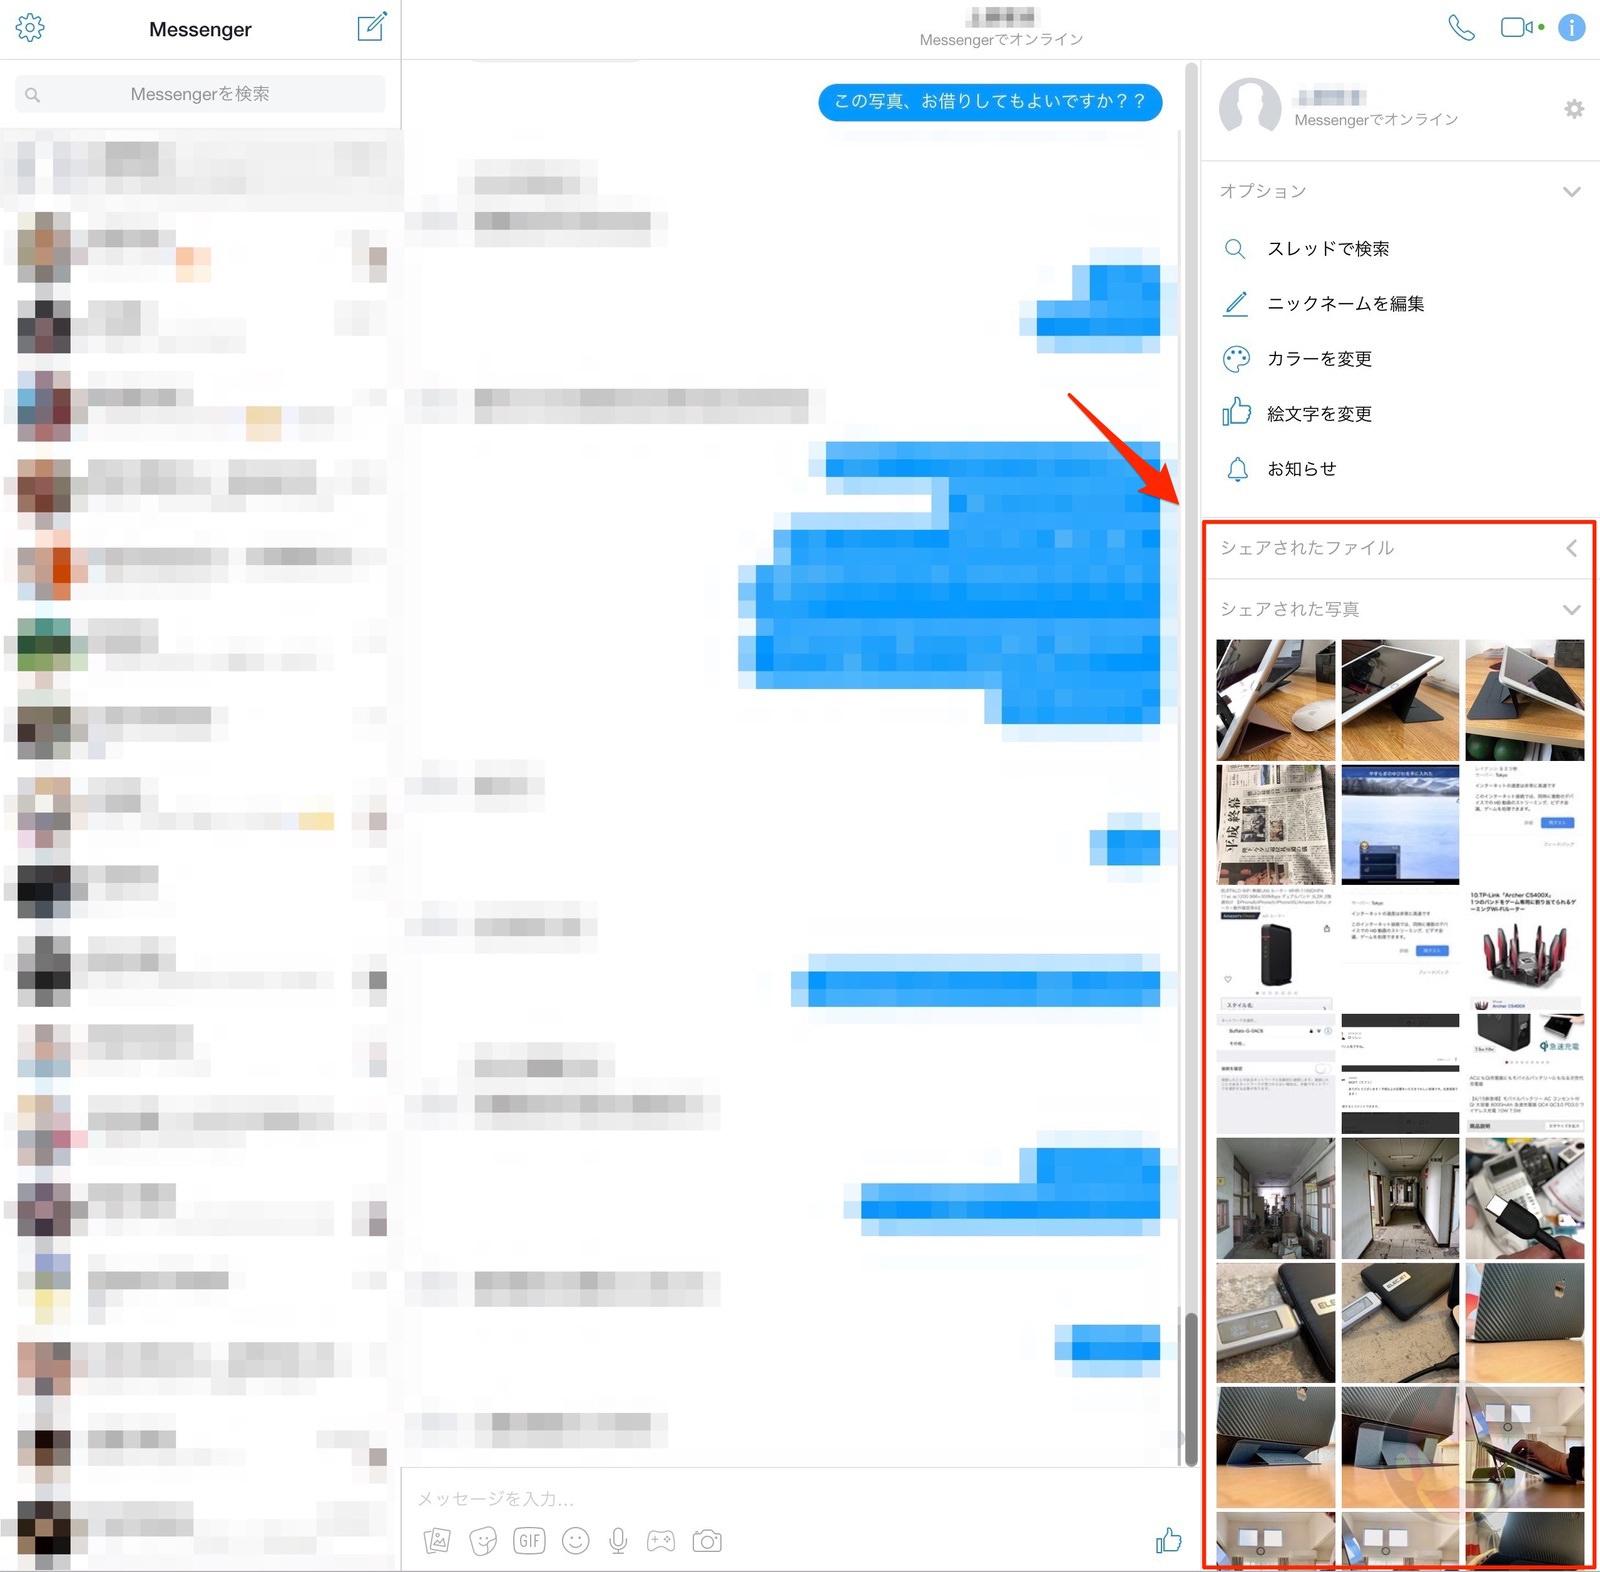 Messenger Com gallery access 01